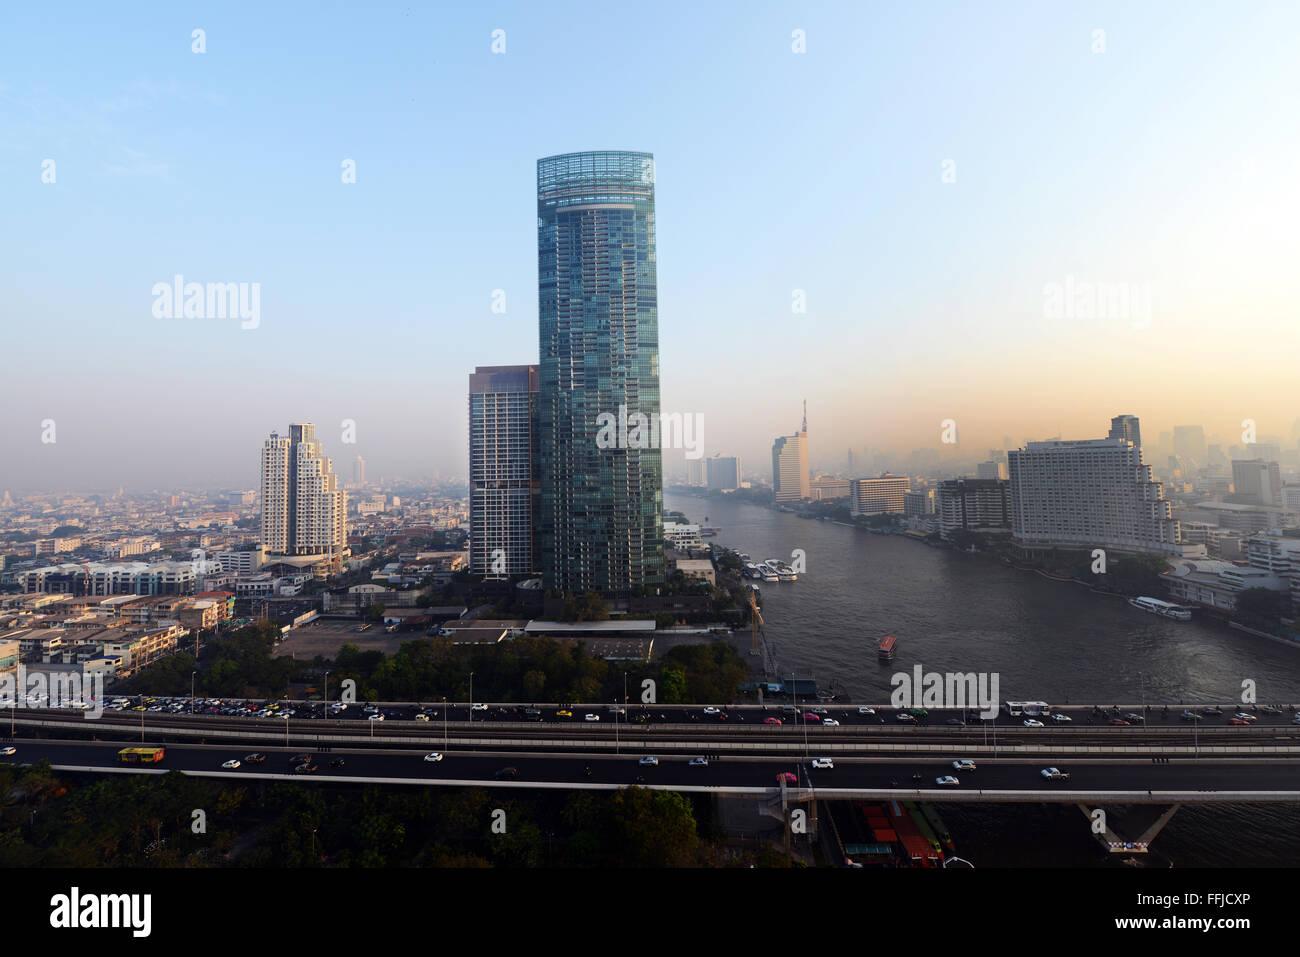 Il fiume torre residenziale dal fiume Chao Phraya a Bangkok. Immagini Stock